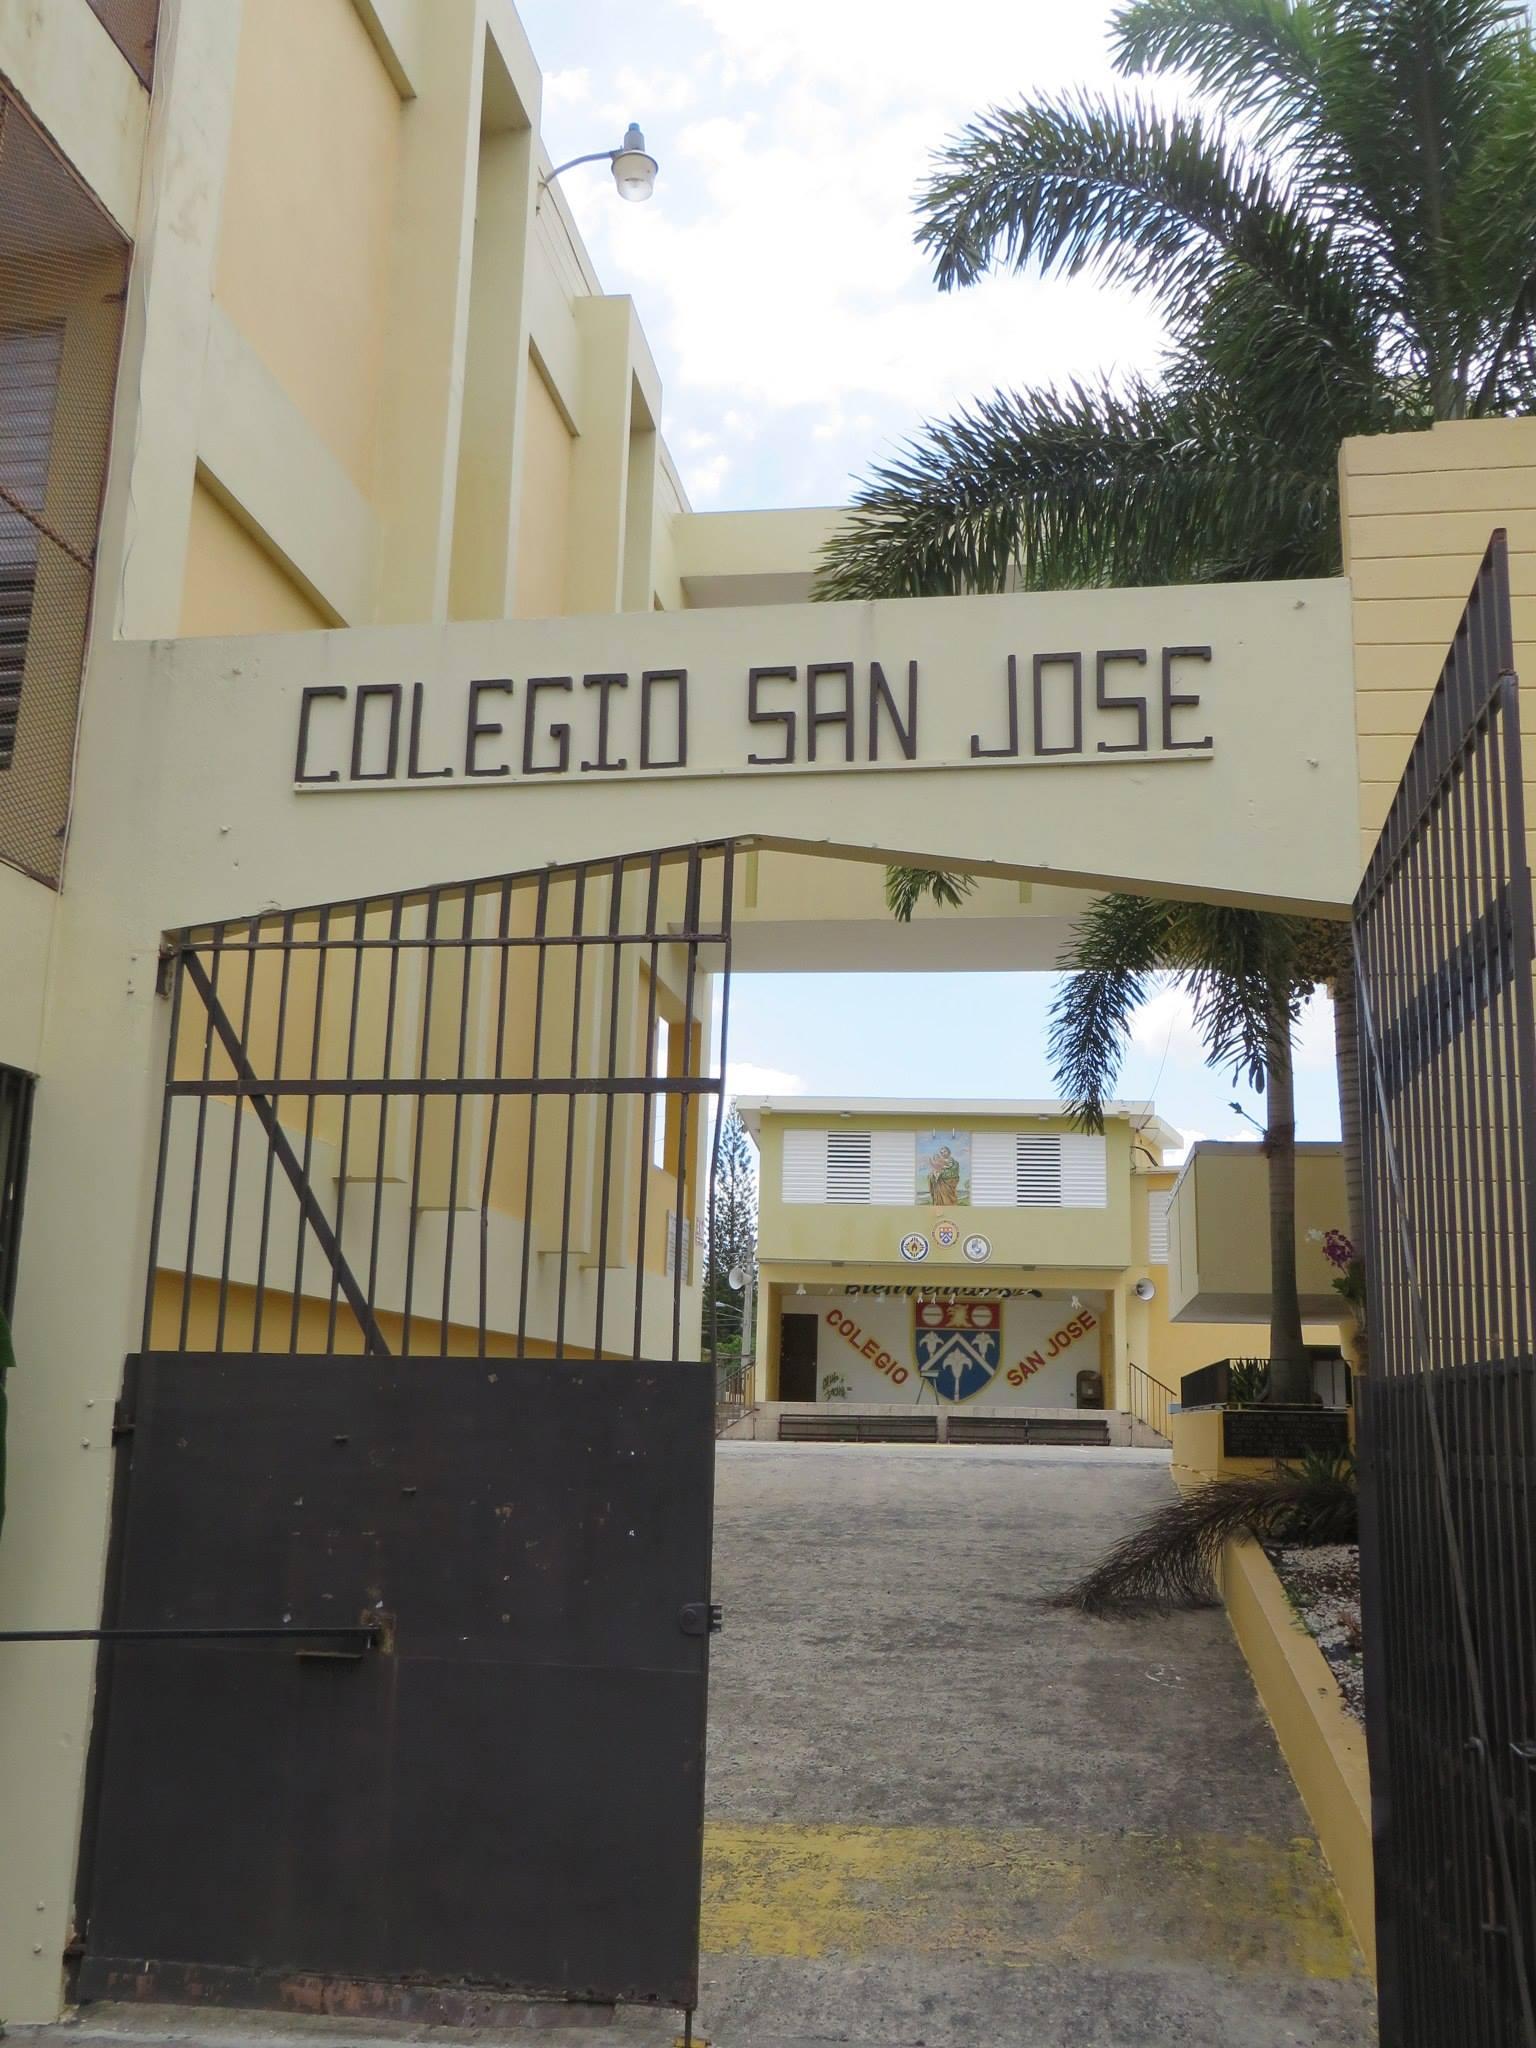 I went to Catholic School from K-12 grade.